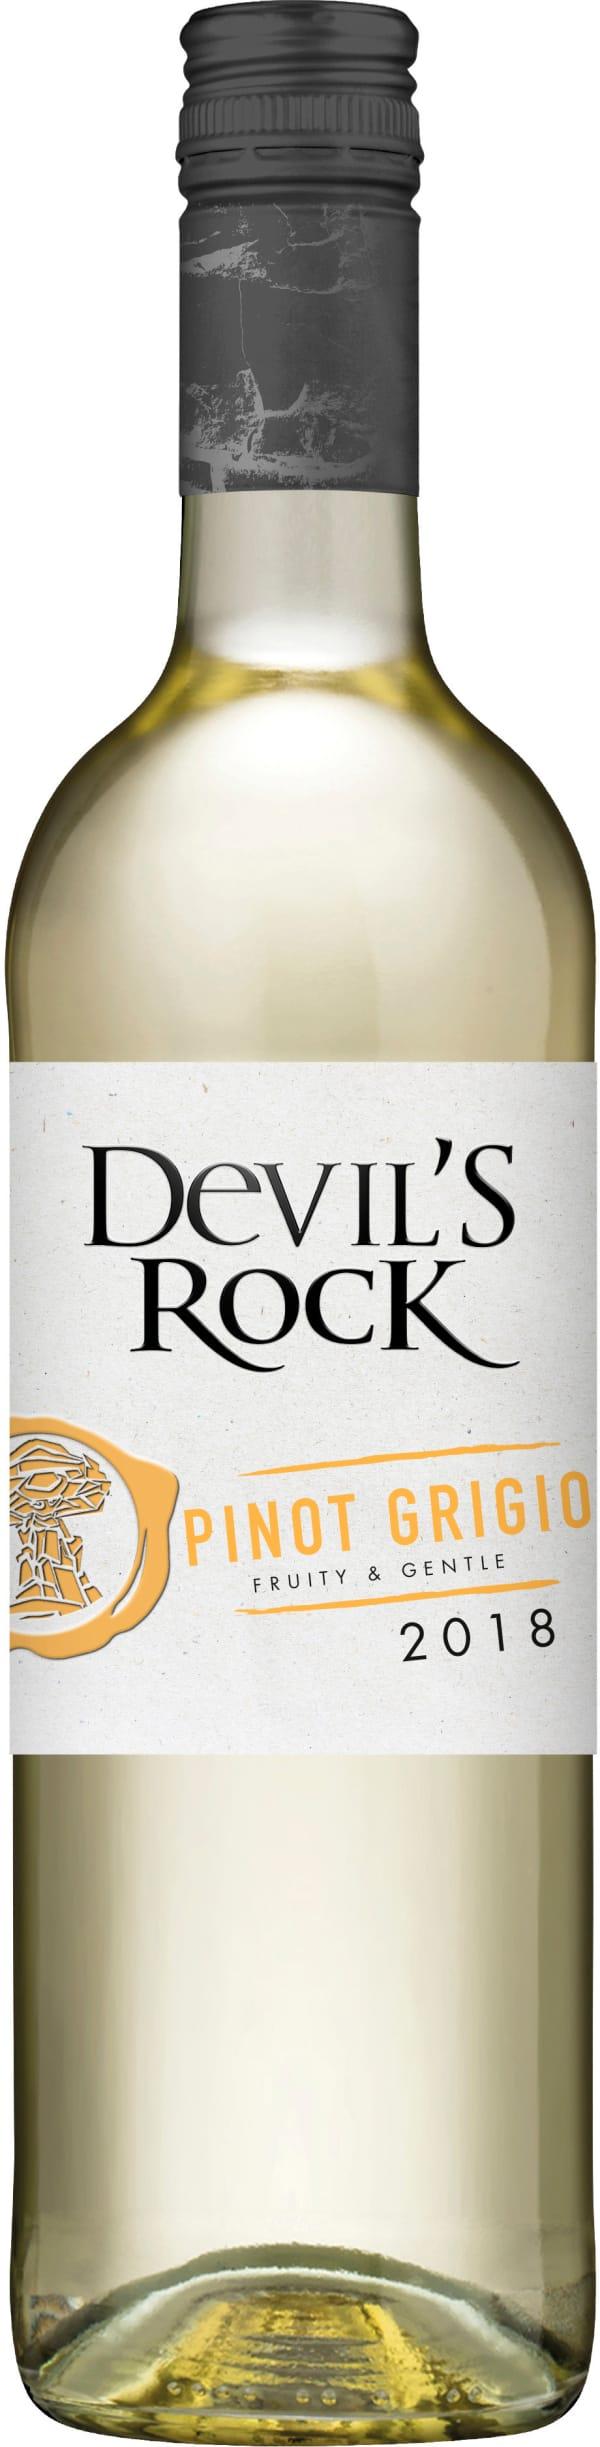 Devil's Rock Pinot Grigio 2020